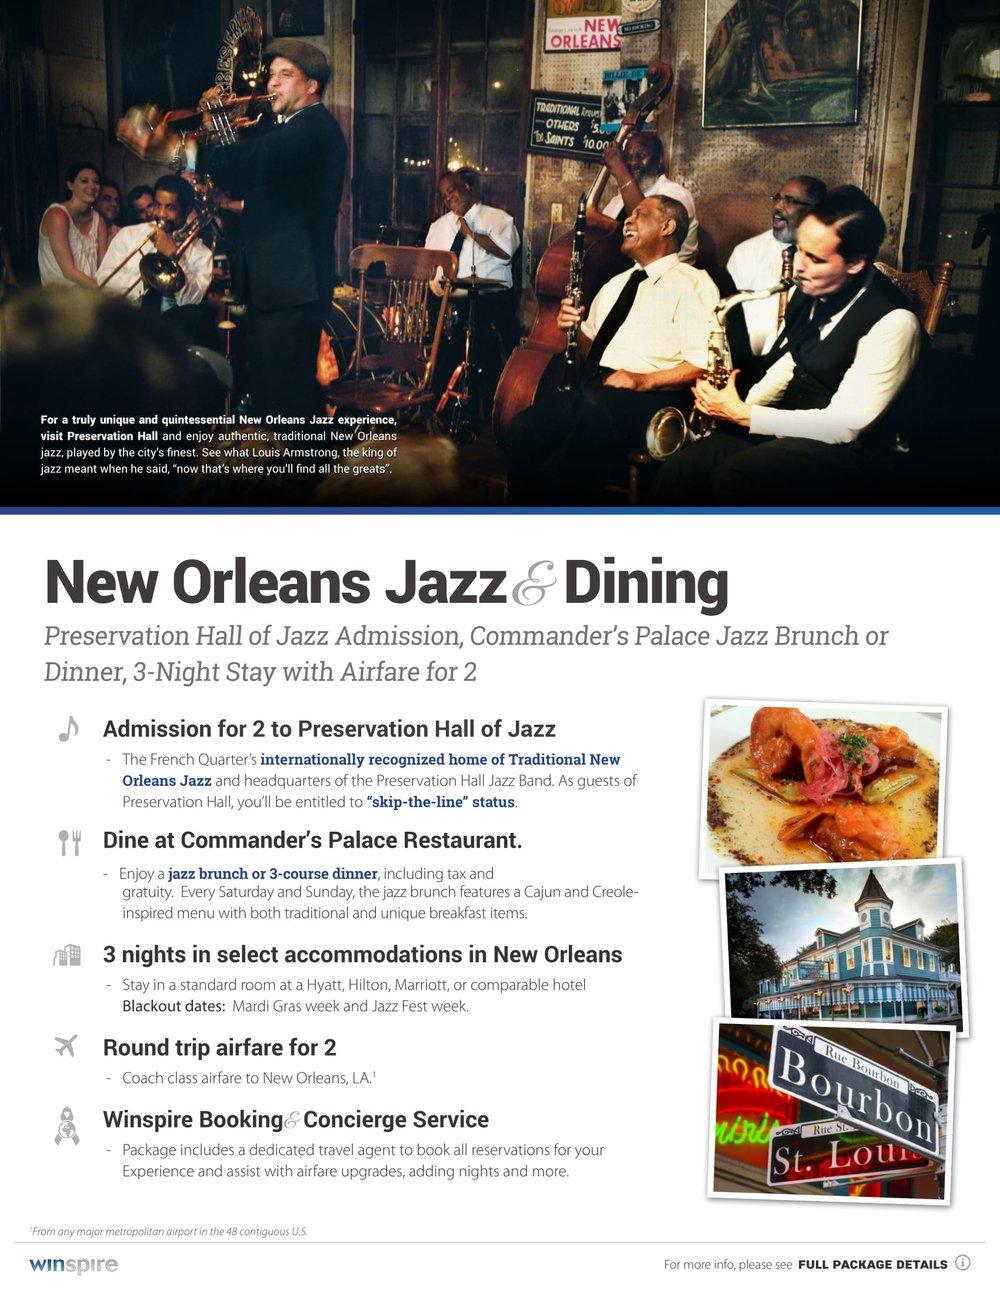 DISPLAY-2050-2 New Orleans Jazz Dining-20161104-1.jpg